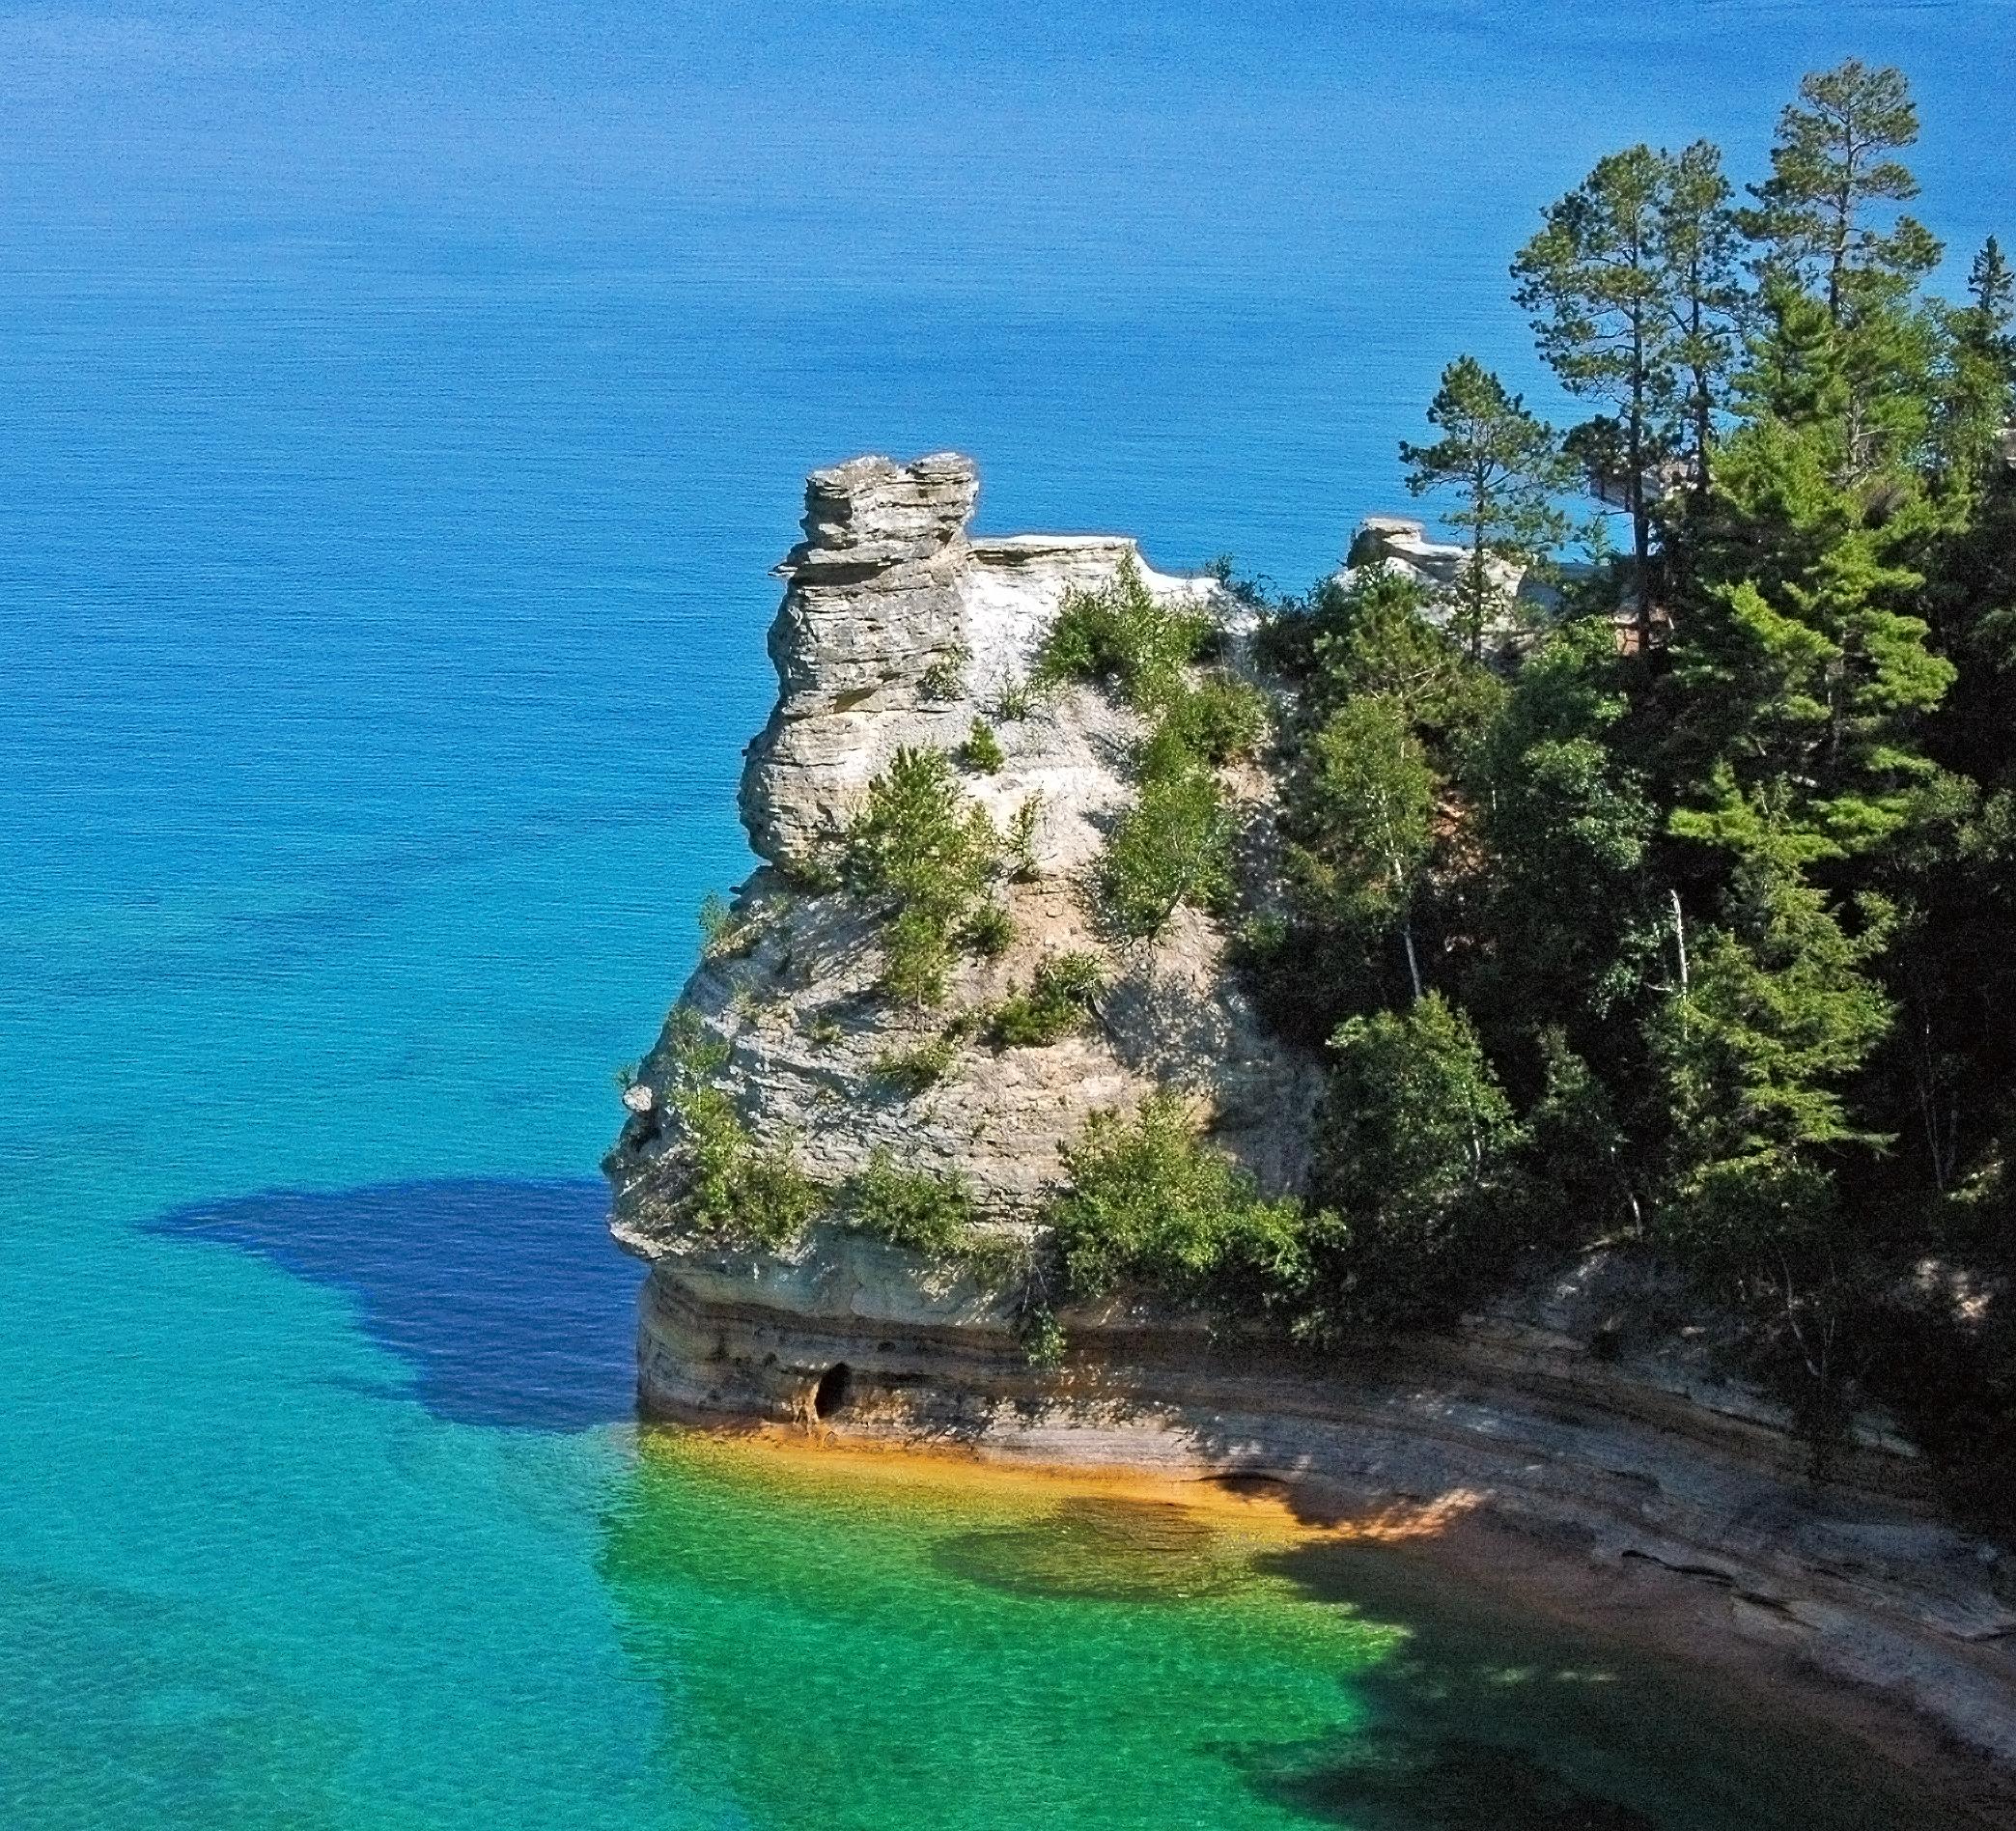 Pictured Rocks Michgan National Lakeshore